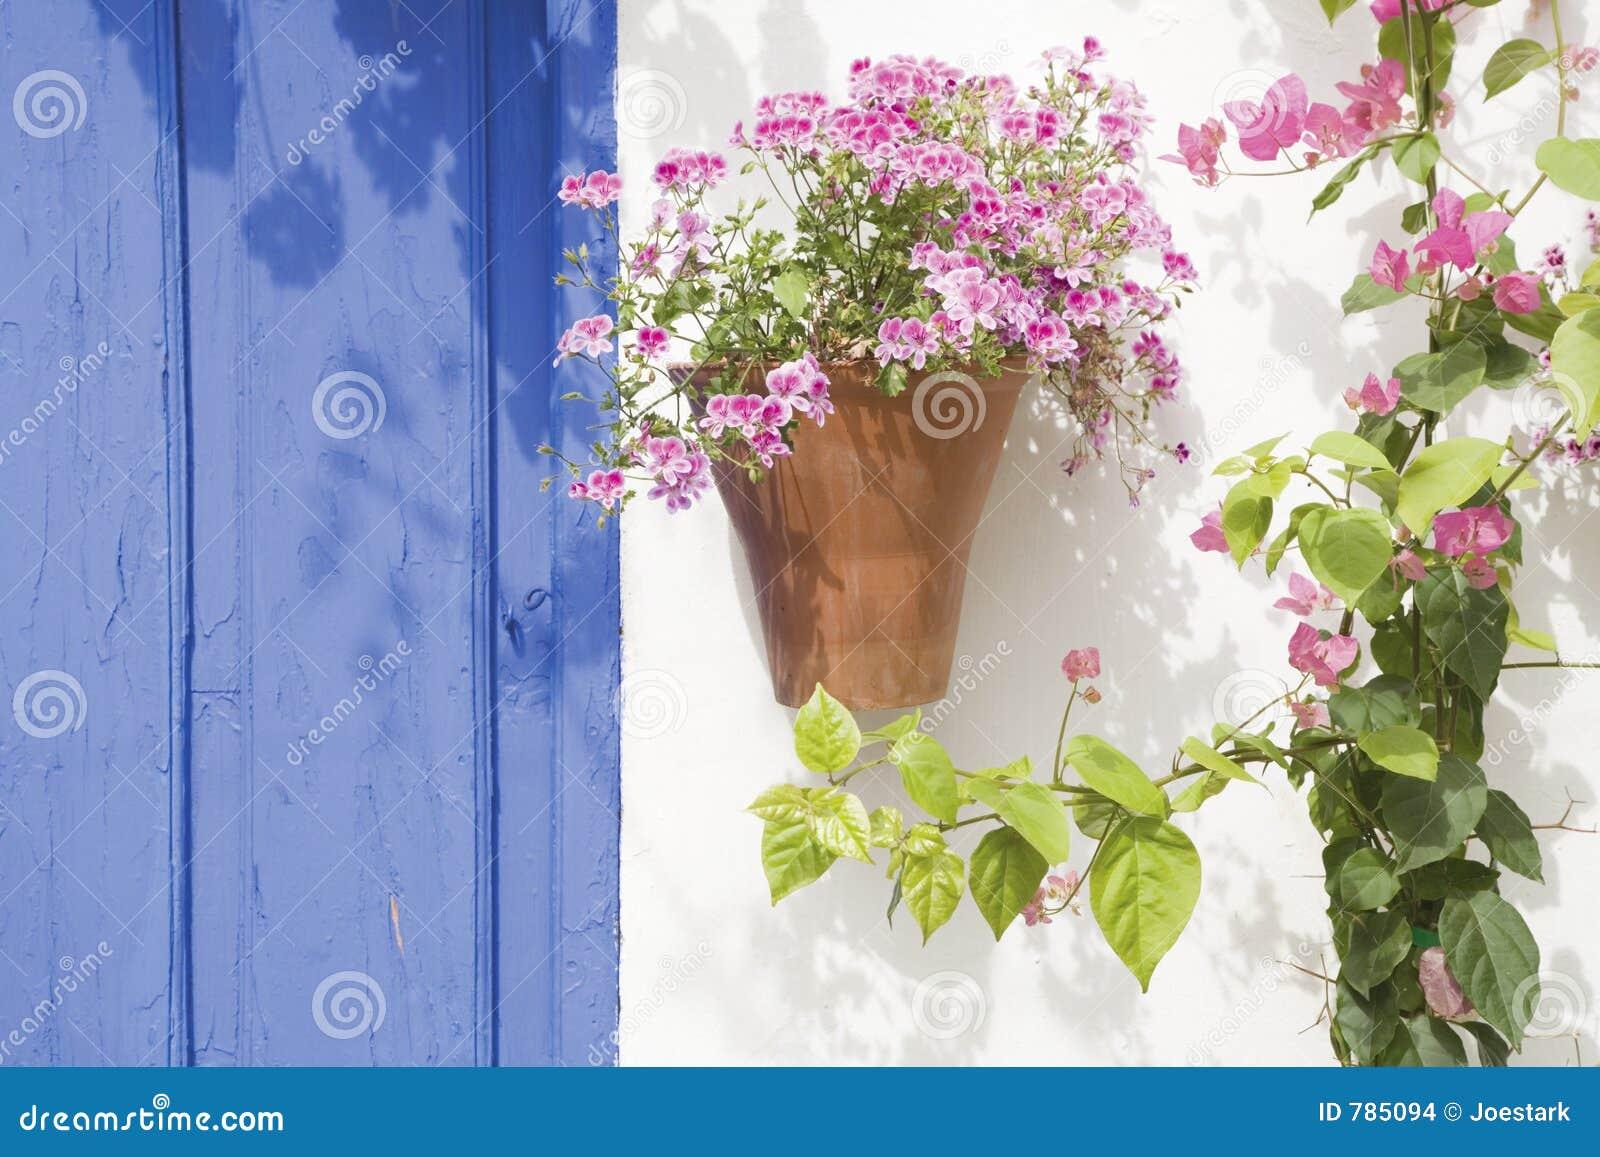 Spanish Flowers Stock Image